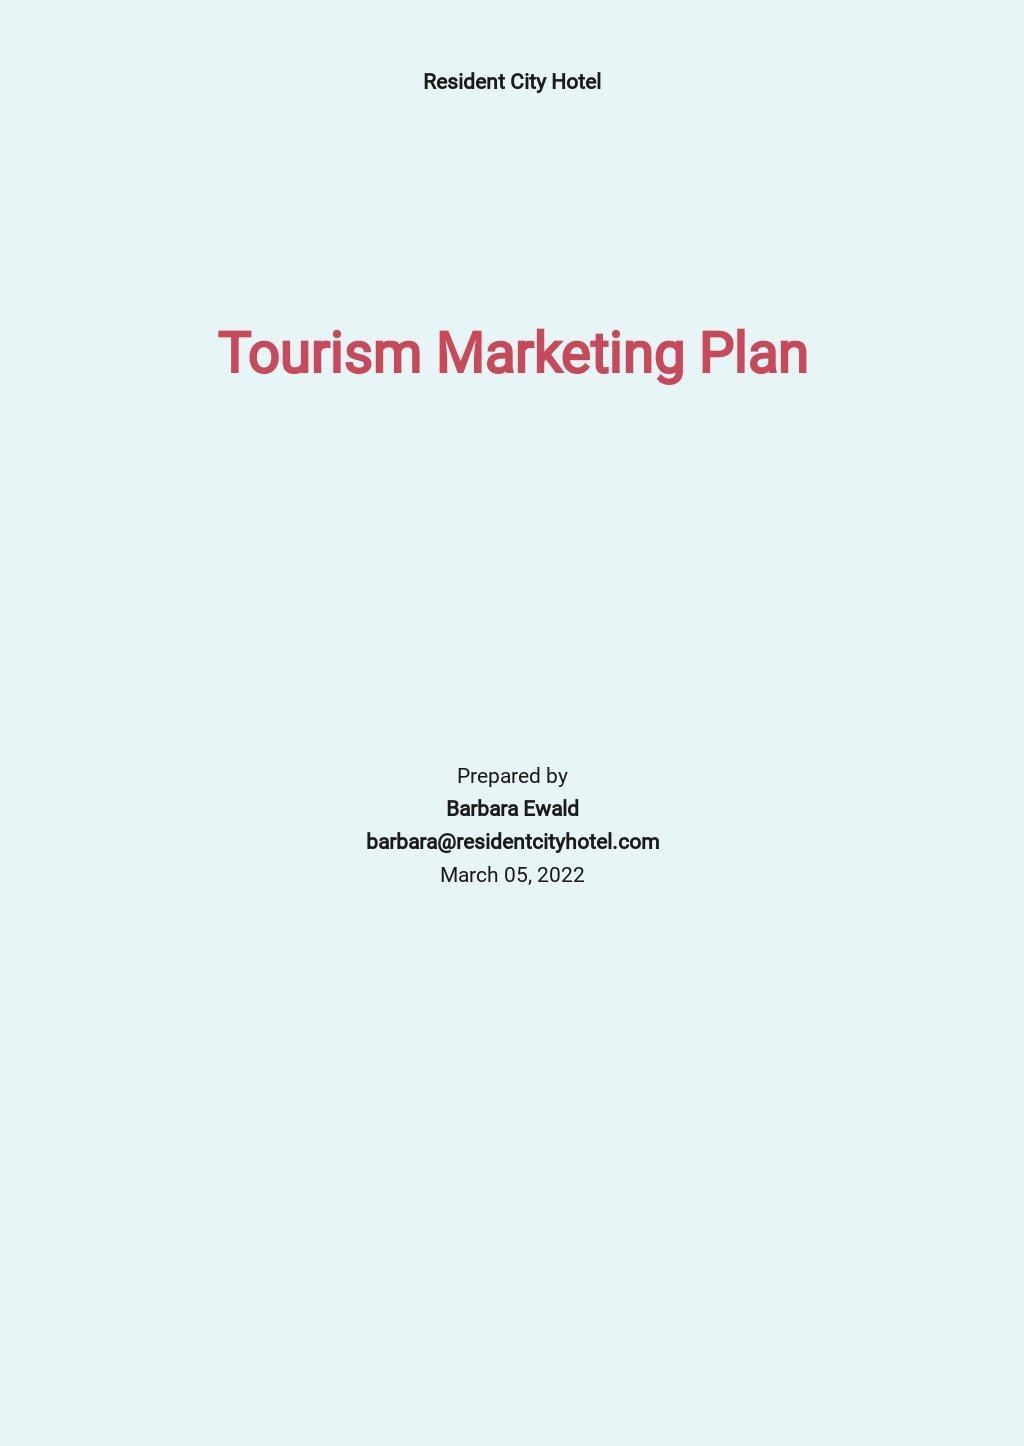 Tourism Marketing Plan Template